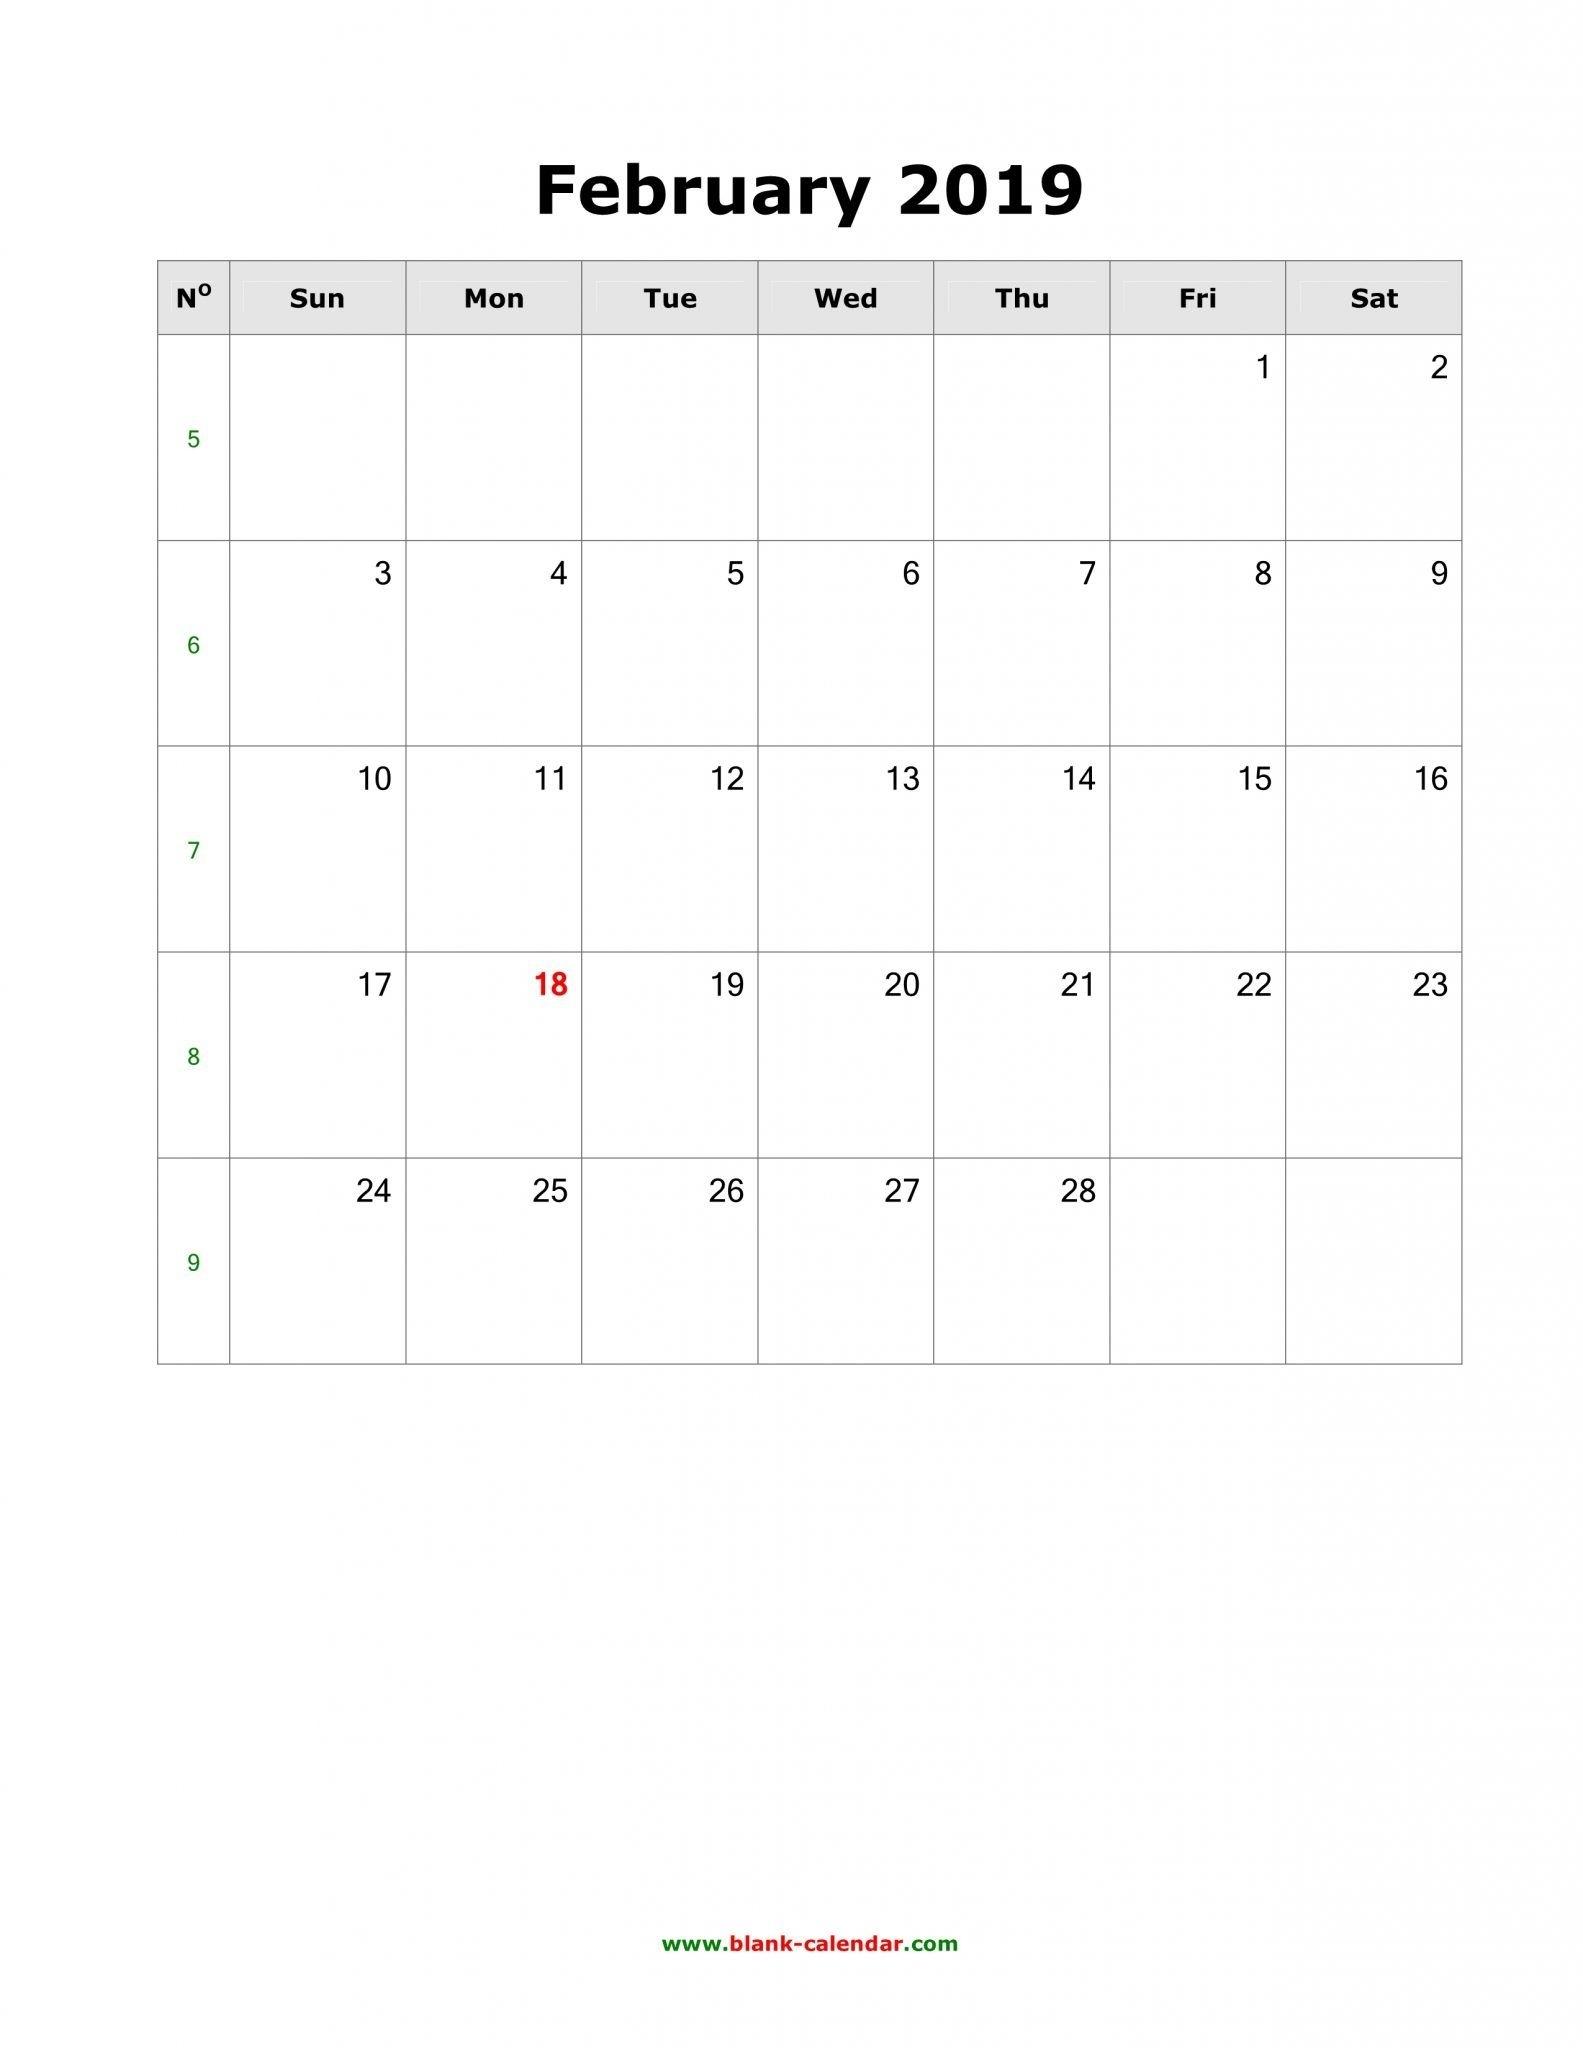 February 2019 Calendar A4 Size | Free Printable February 2019 throughout Full Size Printable Monthly Calendars